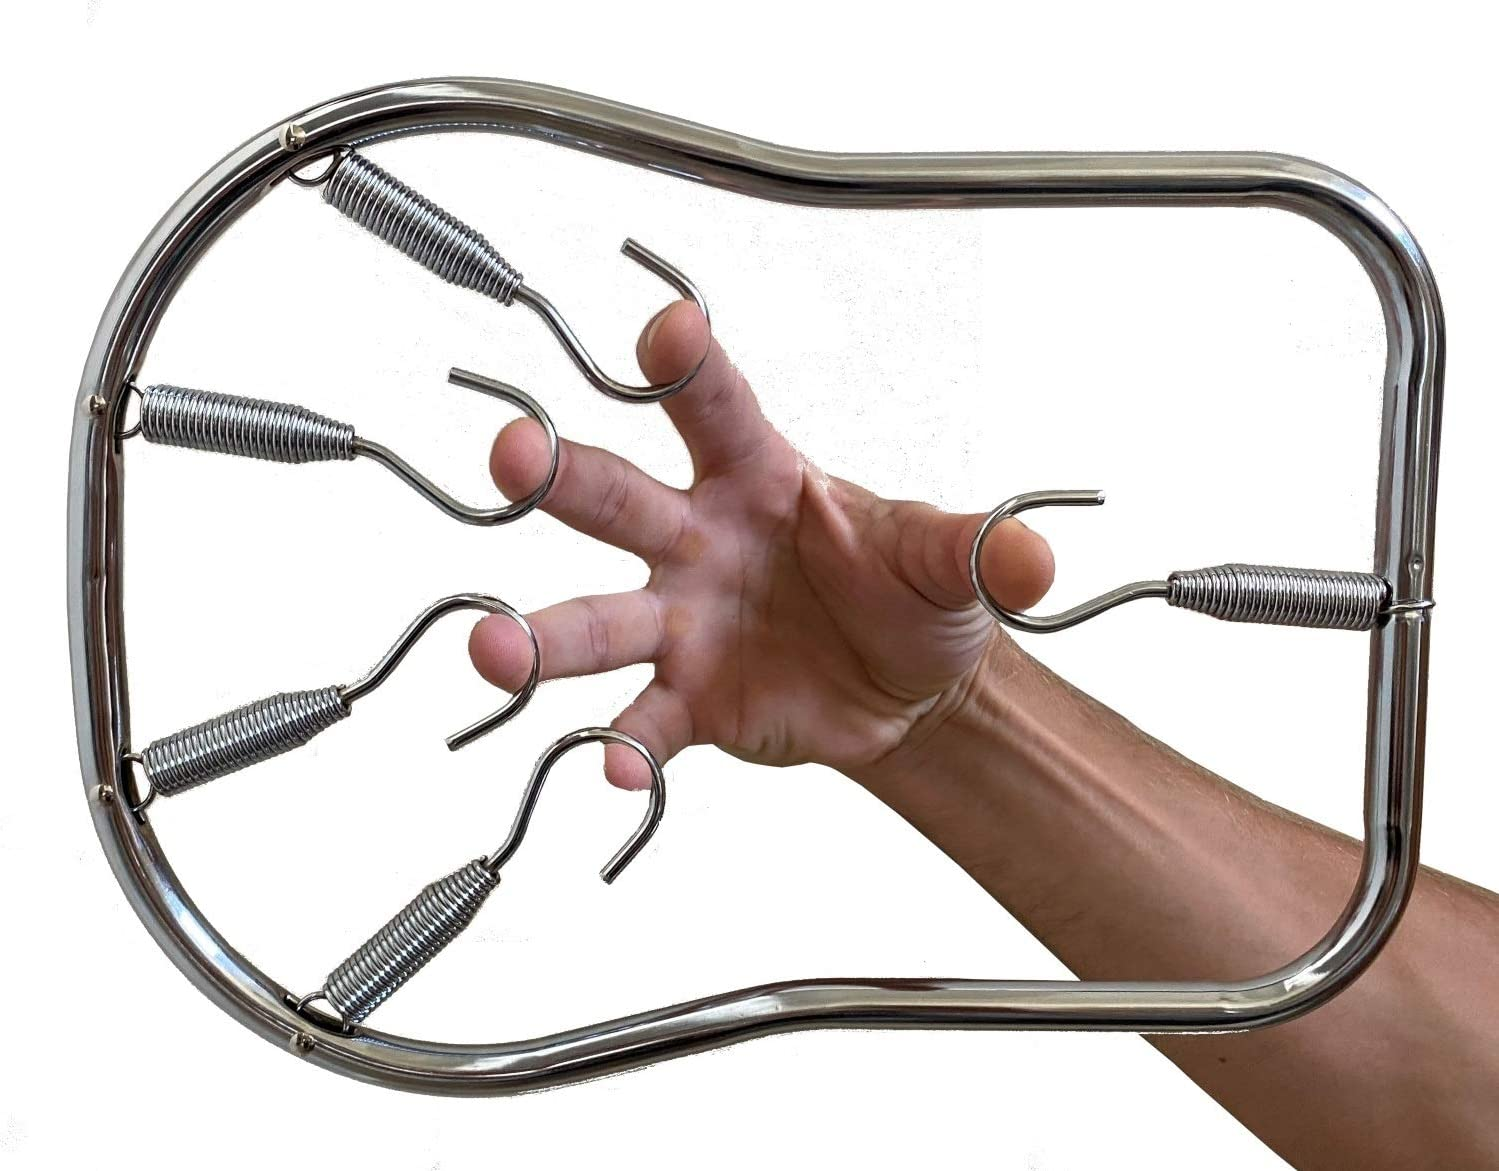 Sedroc overseas Eagle Catcher Hand Strengthener Wrist Quantity limited Grip Trainer Exerci